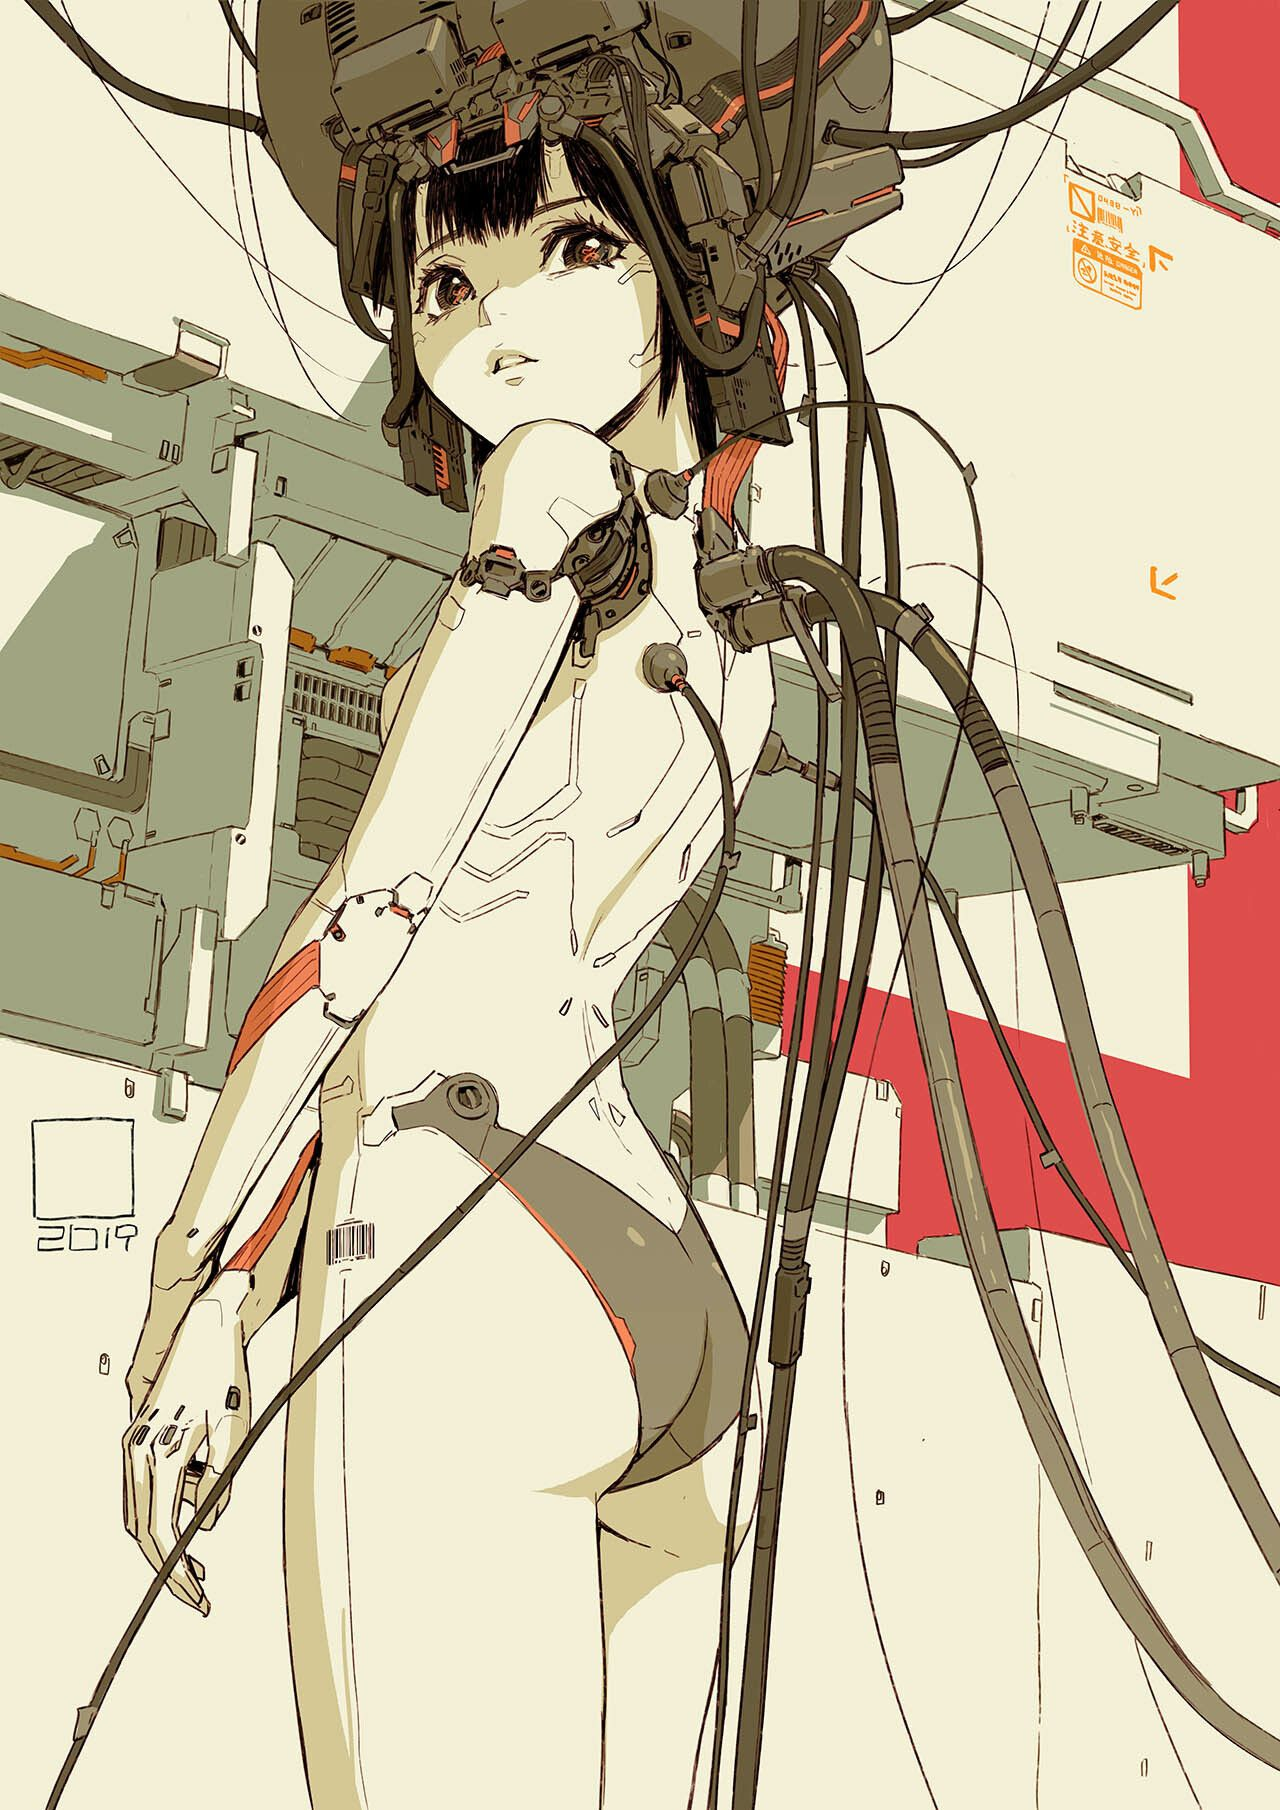 Fafifefoto Cyborg Girl07 Tan Di Cyberpunk Art Cyborg Anime Cyborg Girl